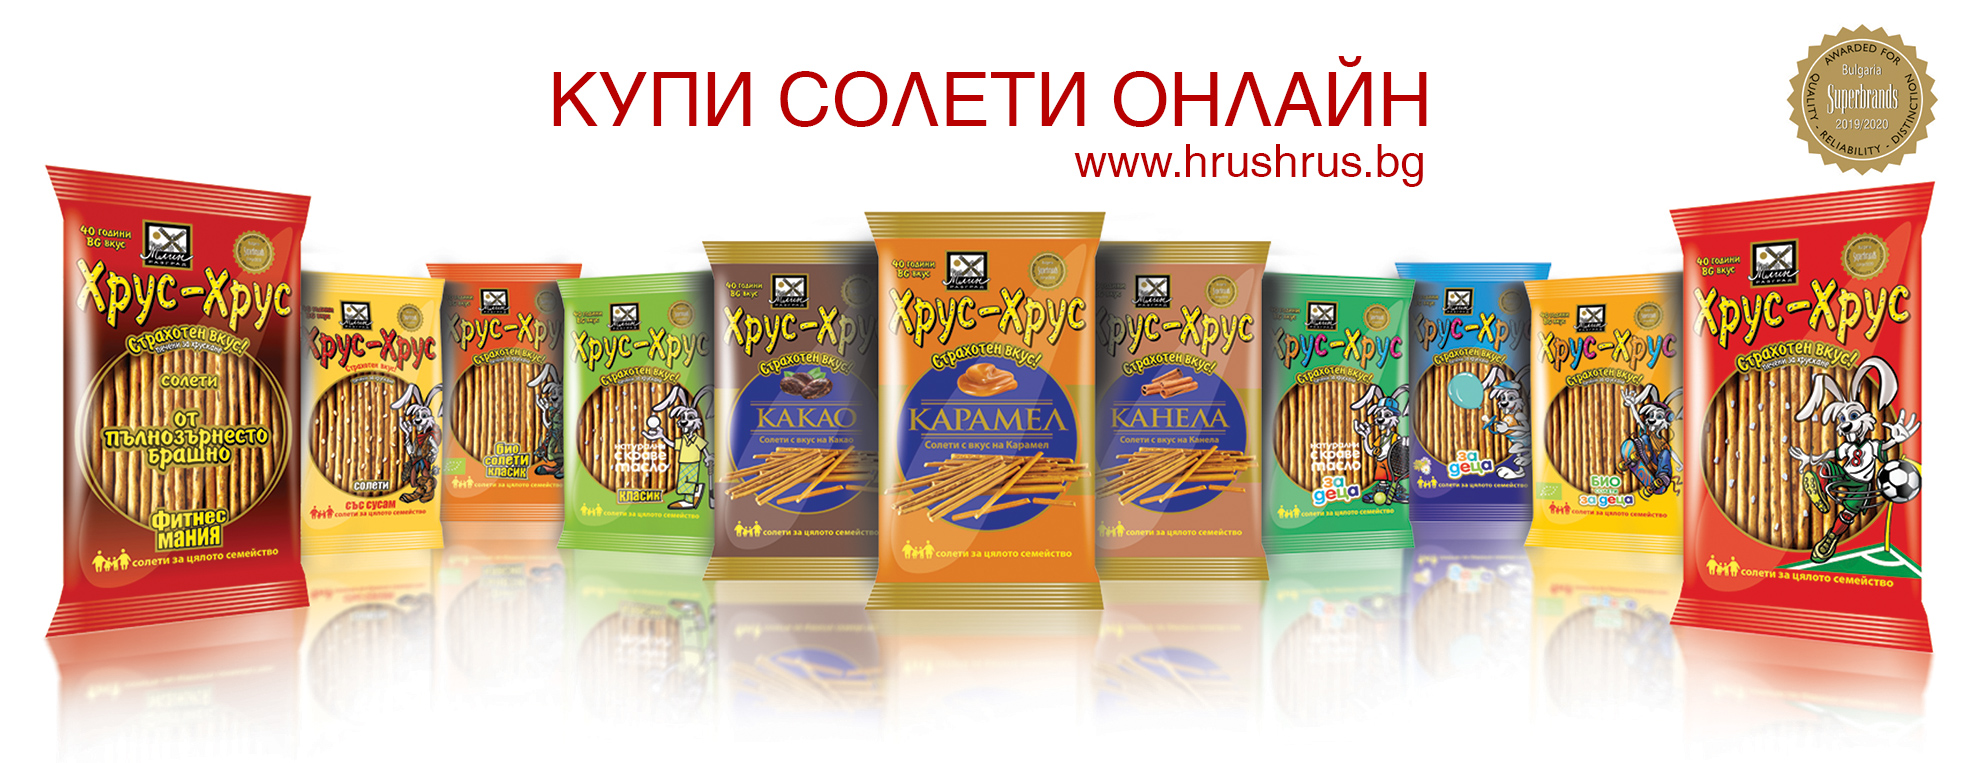 Електронен магазин HrusHrus.bg